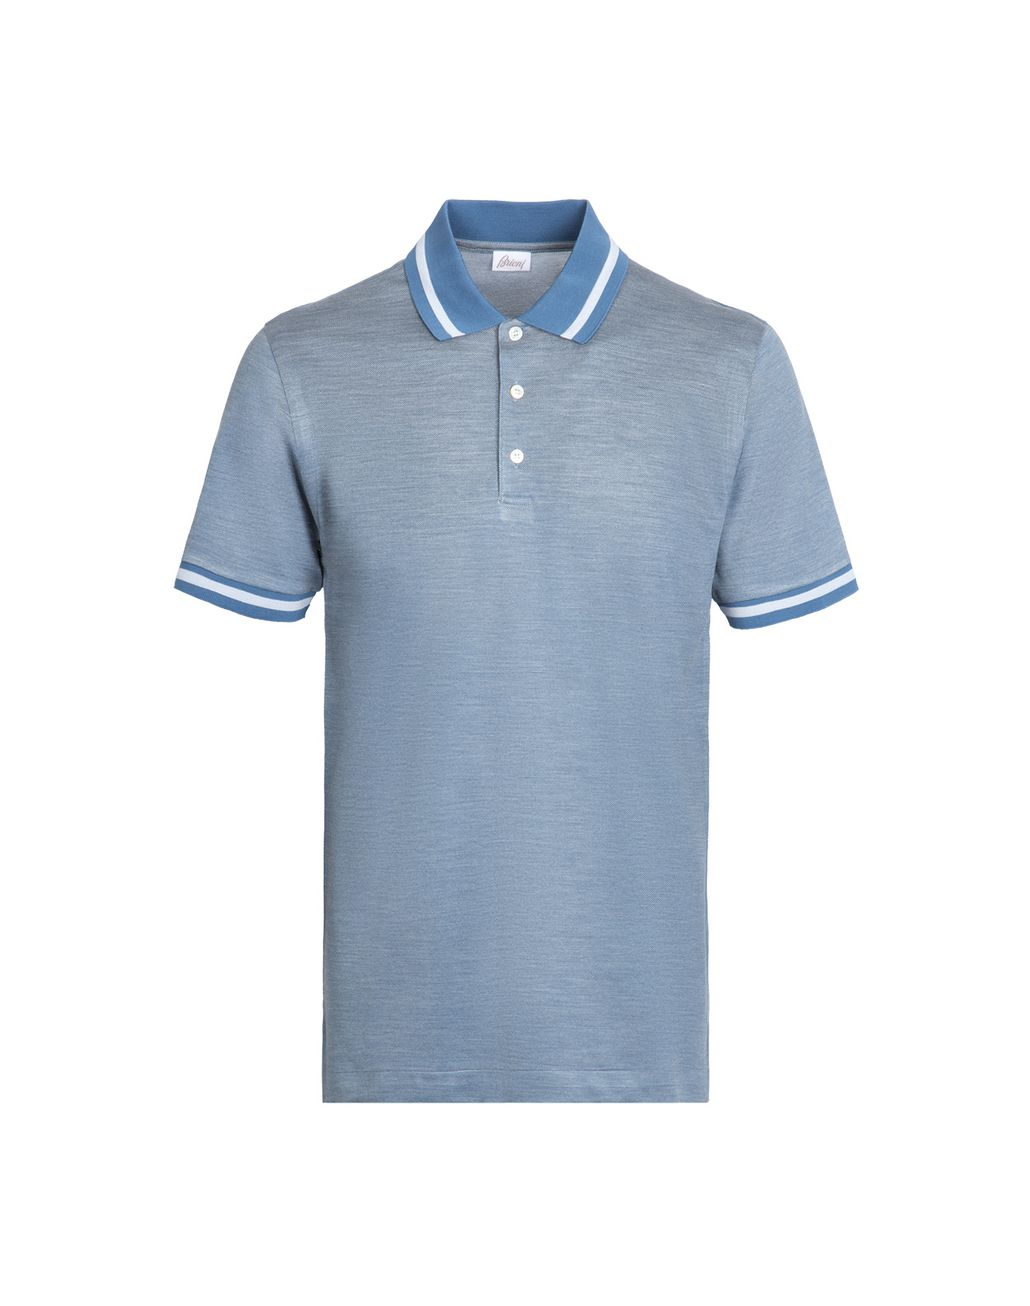 BRIONI Iridescent Sky Blue Polo Shirt T-Shirts & Polos Man r